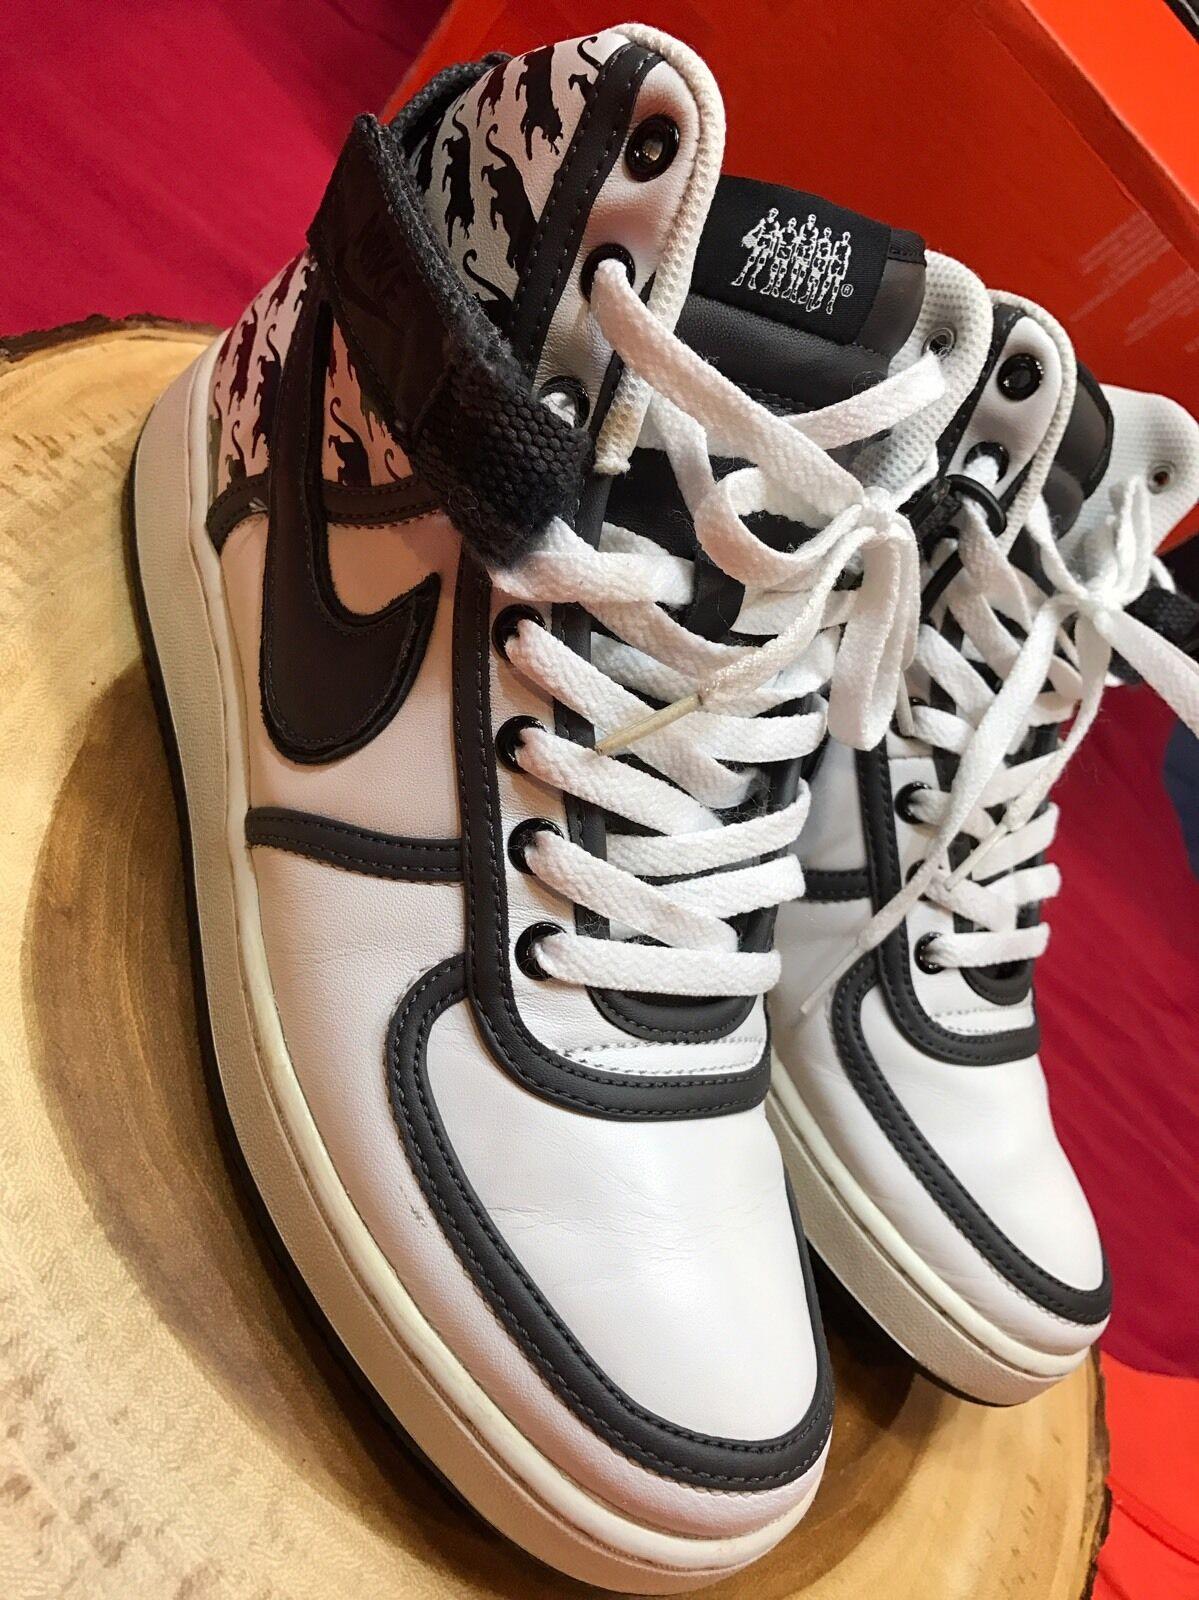 separation shoes 834b8 2ef47 ... Nike Vandal Vandal Vandal High Black White Size 9.5 Philadelphia Philly  Panthers Jordan BFIVE 501dc8 ...